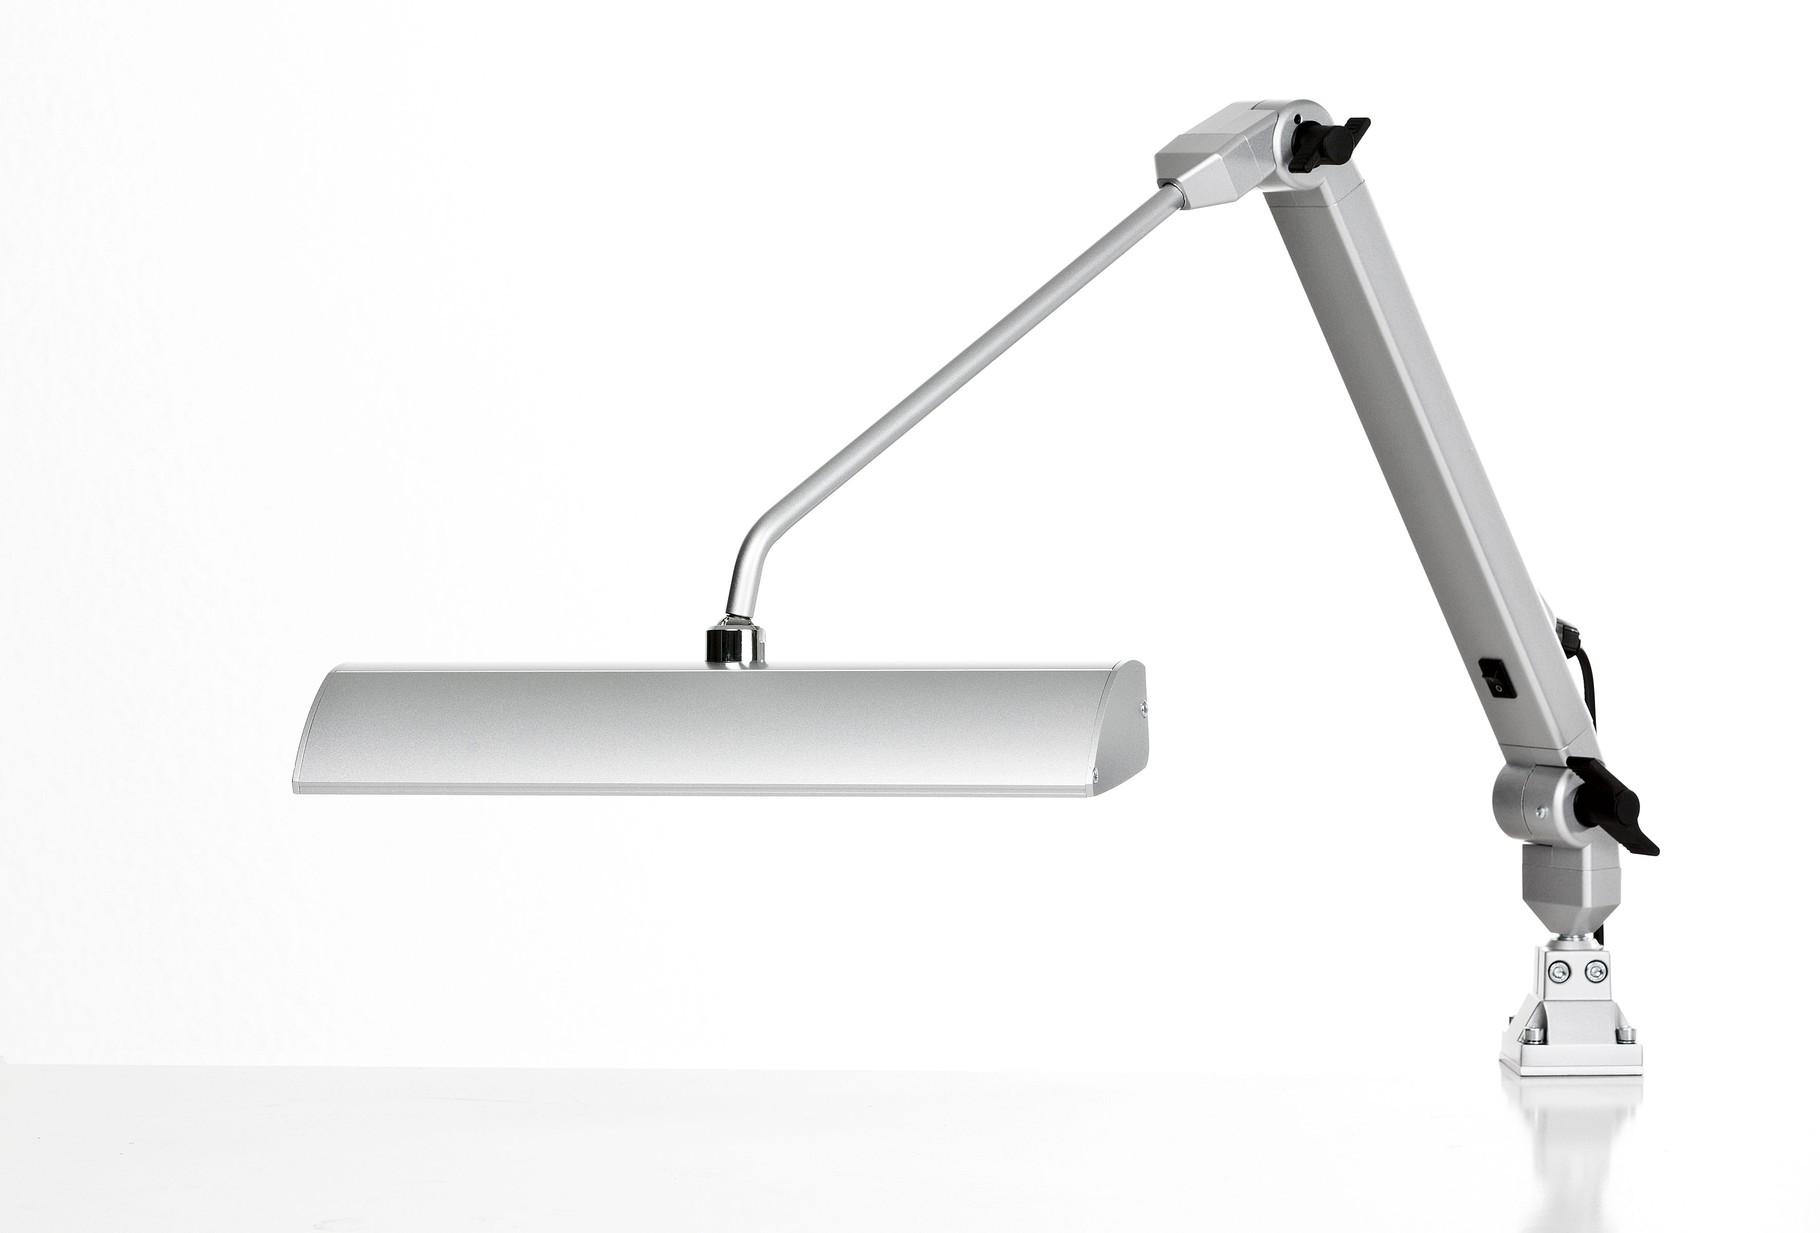 zubeh r fps germany gmbh aluminium profil systeme. Black Bedroom Furniture Sets. Home Design Ideas